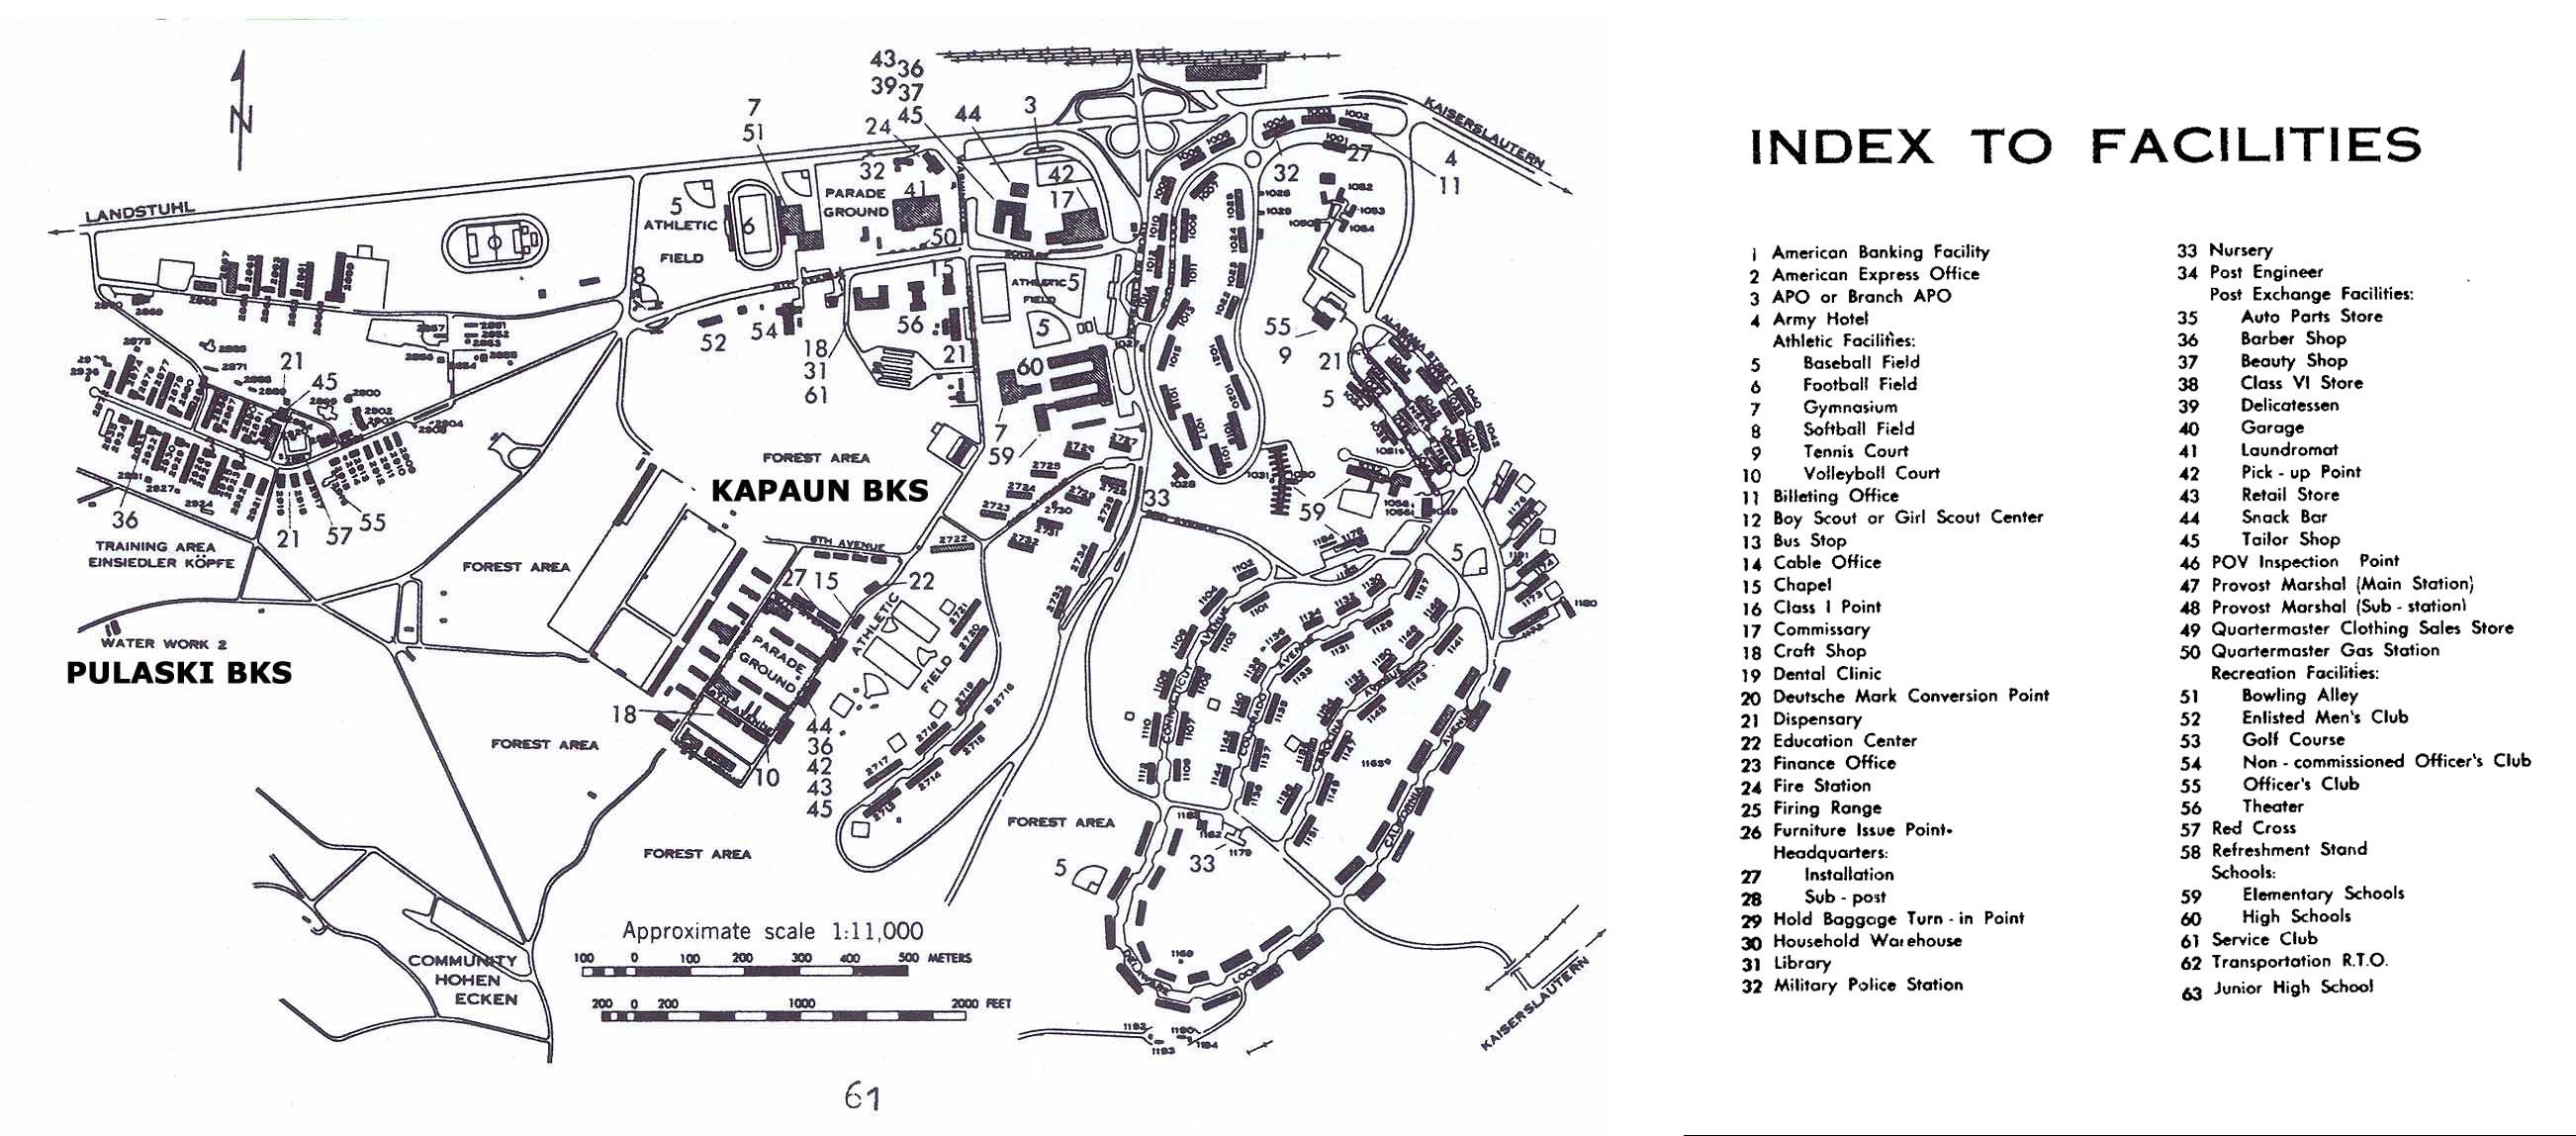 Patch barracks base map